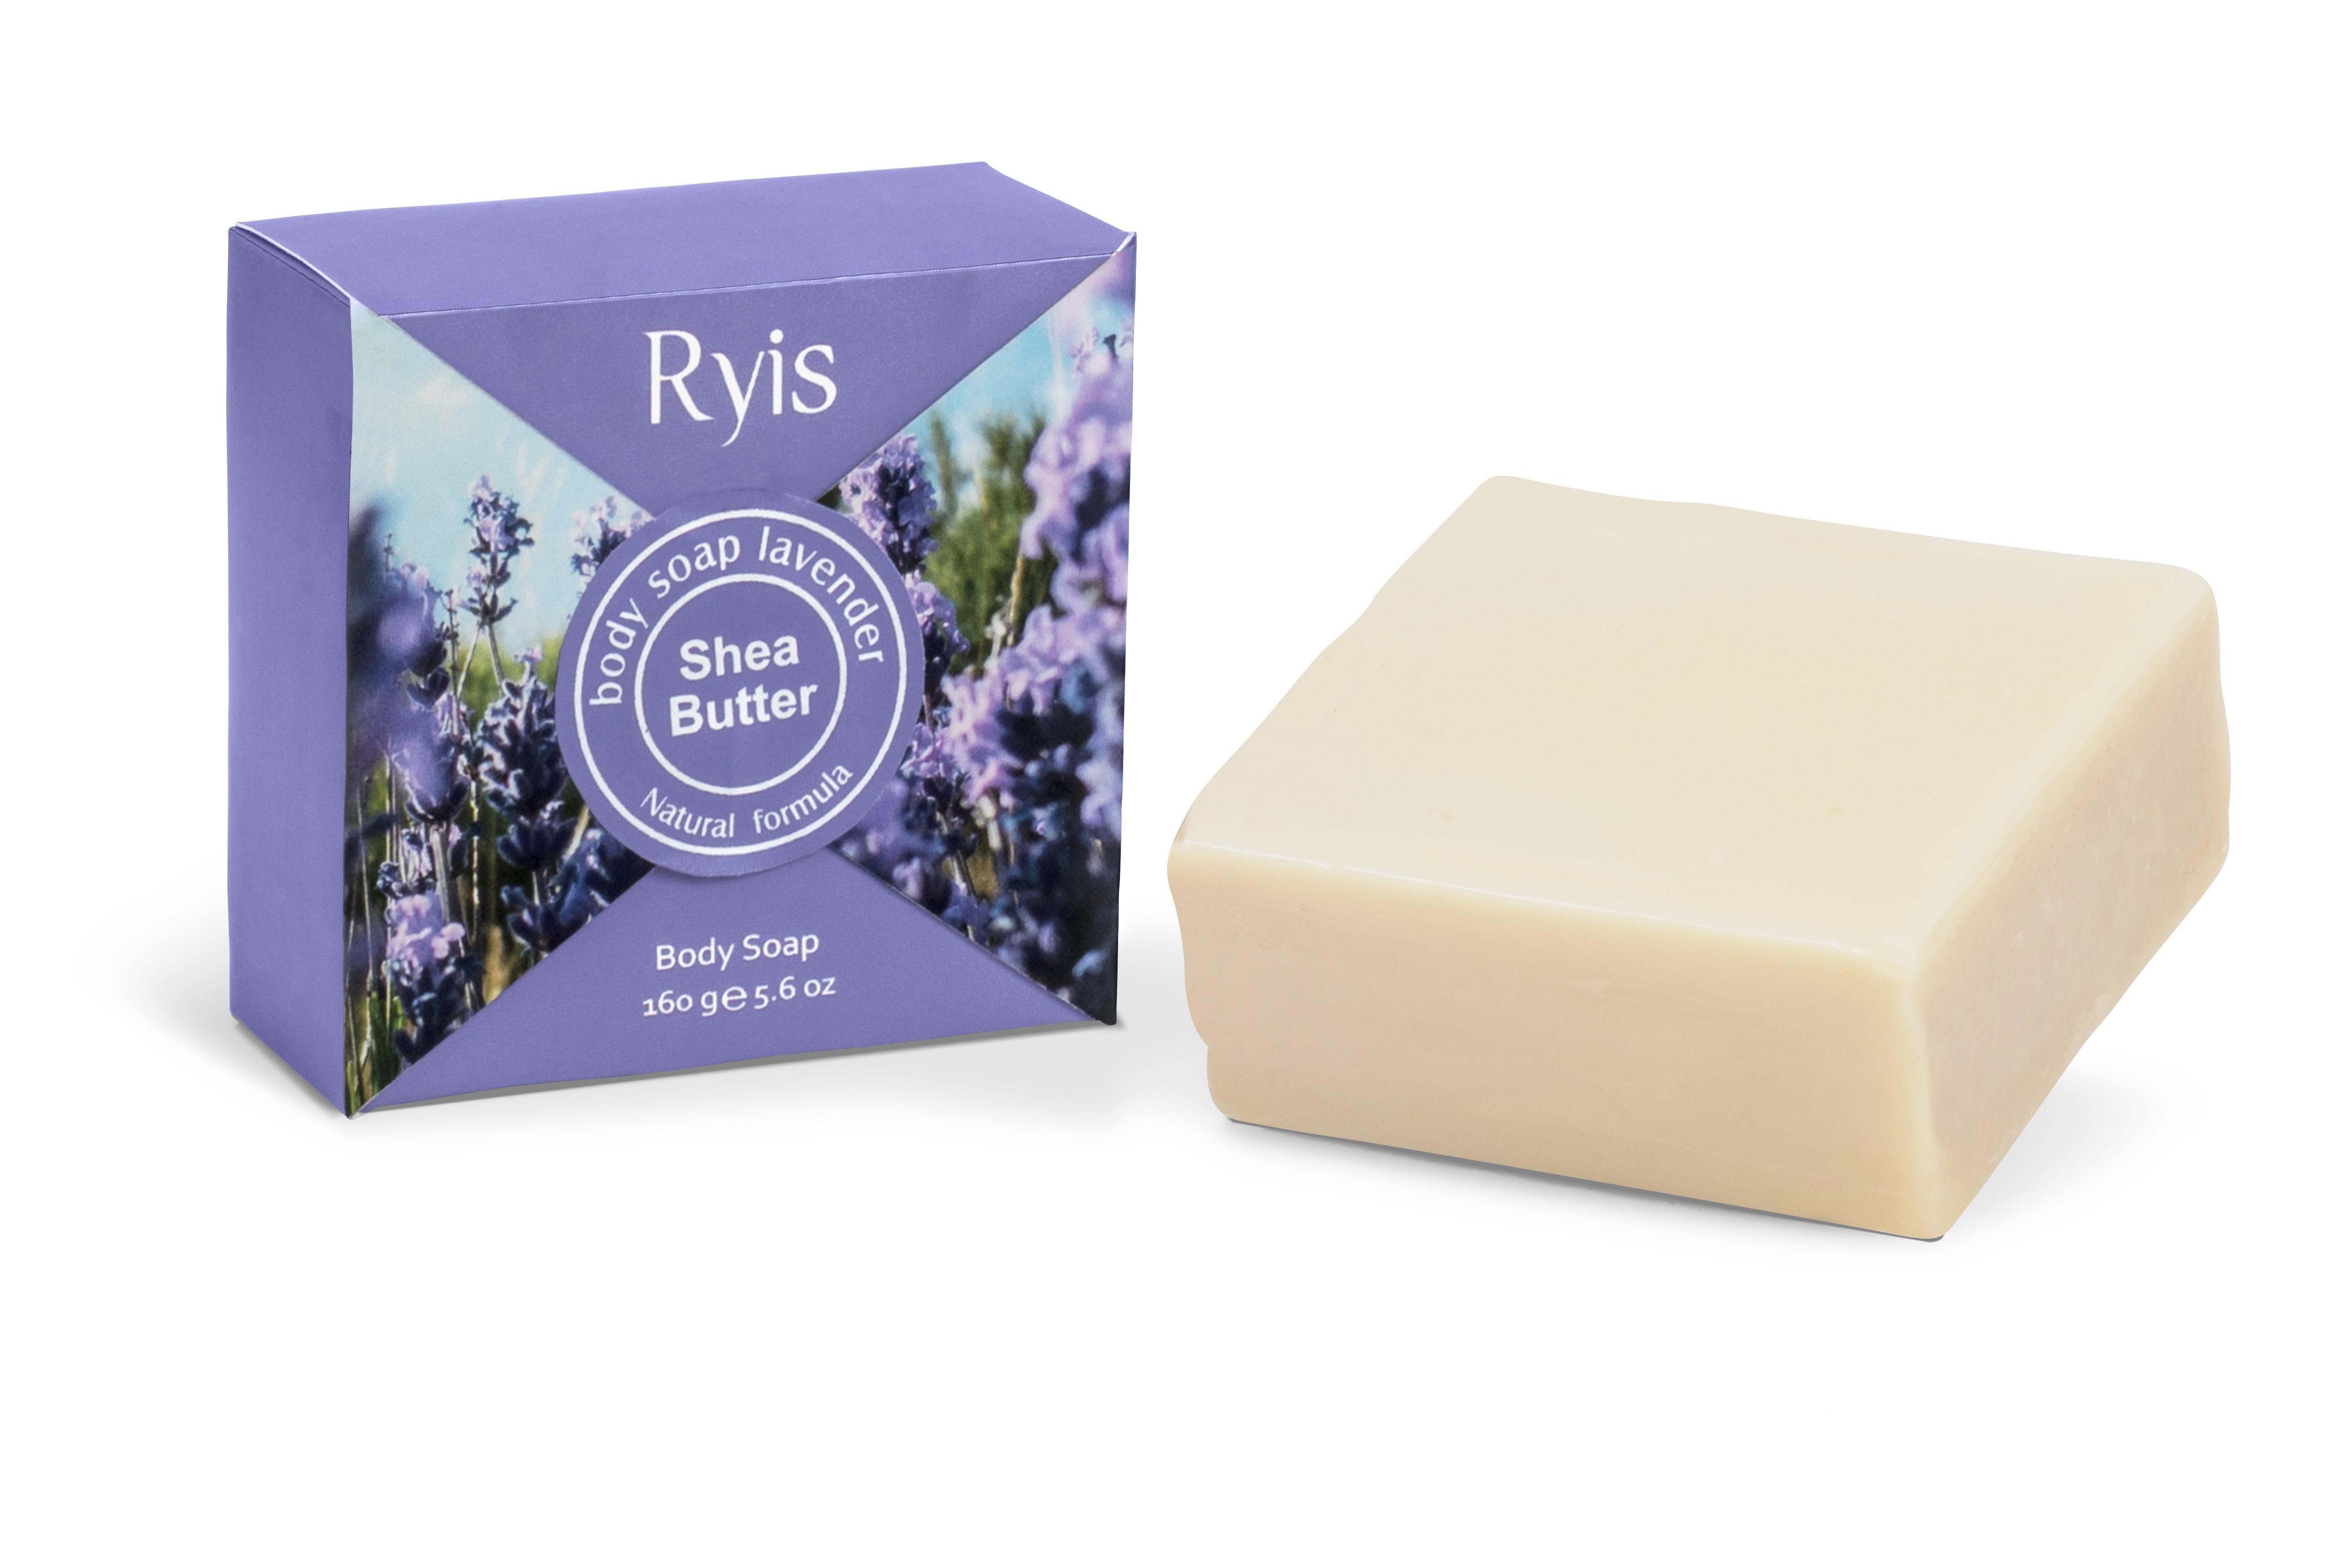 Ryis Body Soap - Purple